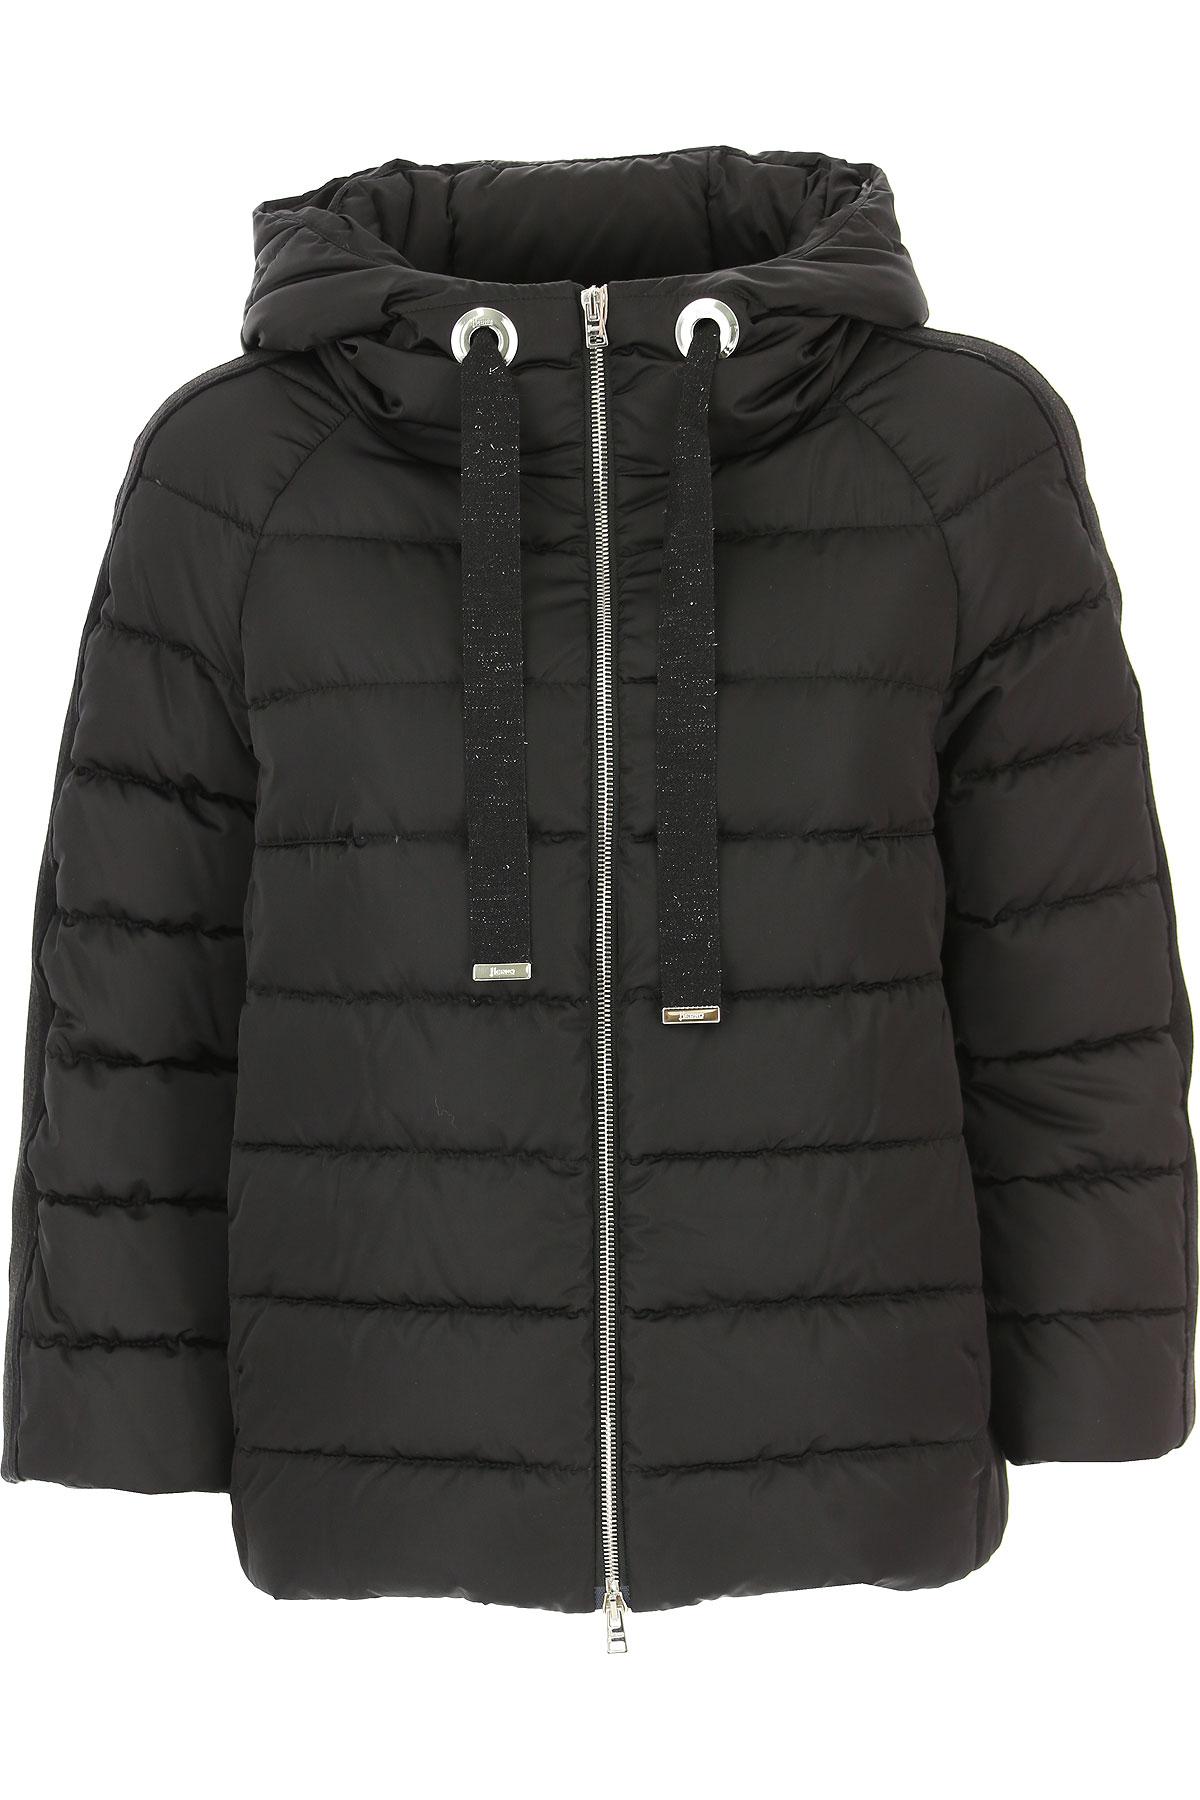 Image of Ermanno Scervino Down Jacket for Women, Puffer Ski Jacket, Black, Down, 2017, 6 8